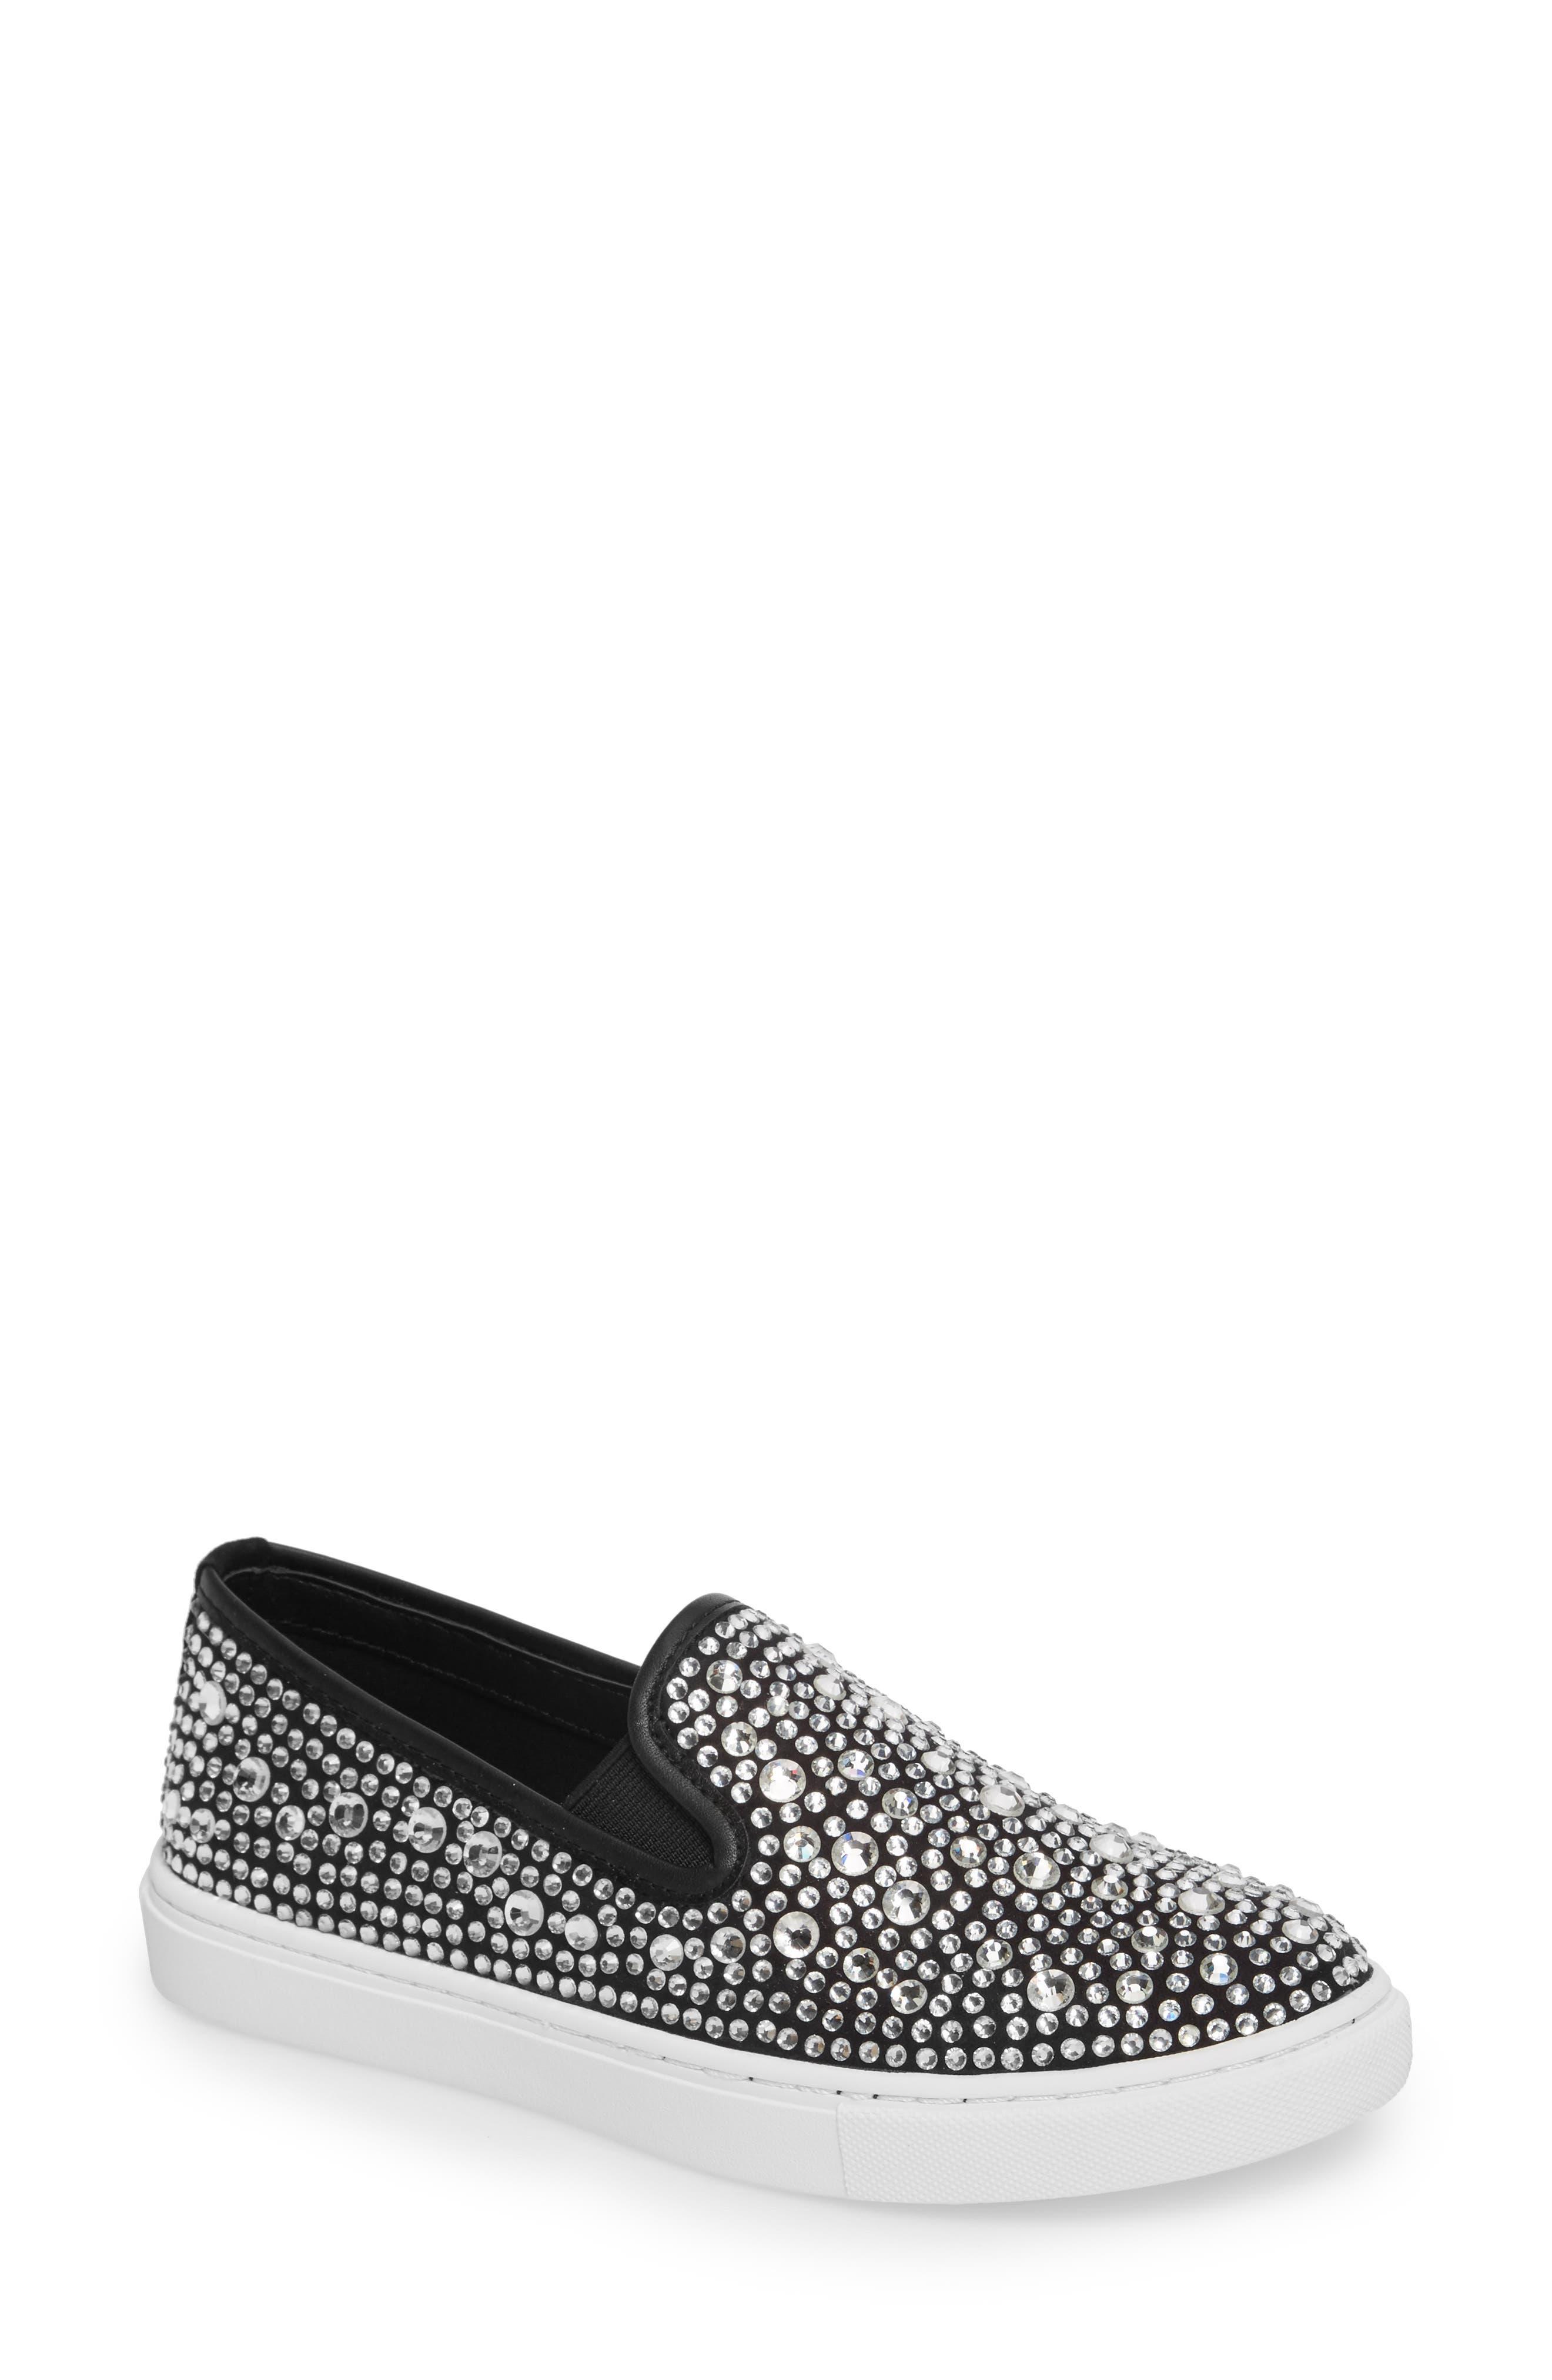 Evada Crystal Embellished Slip-On Sneaker,                             Main thumbnail 1, color,                             040